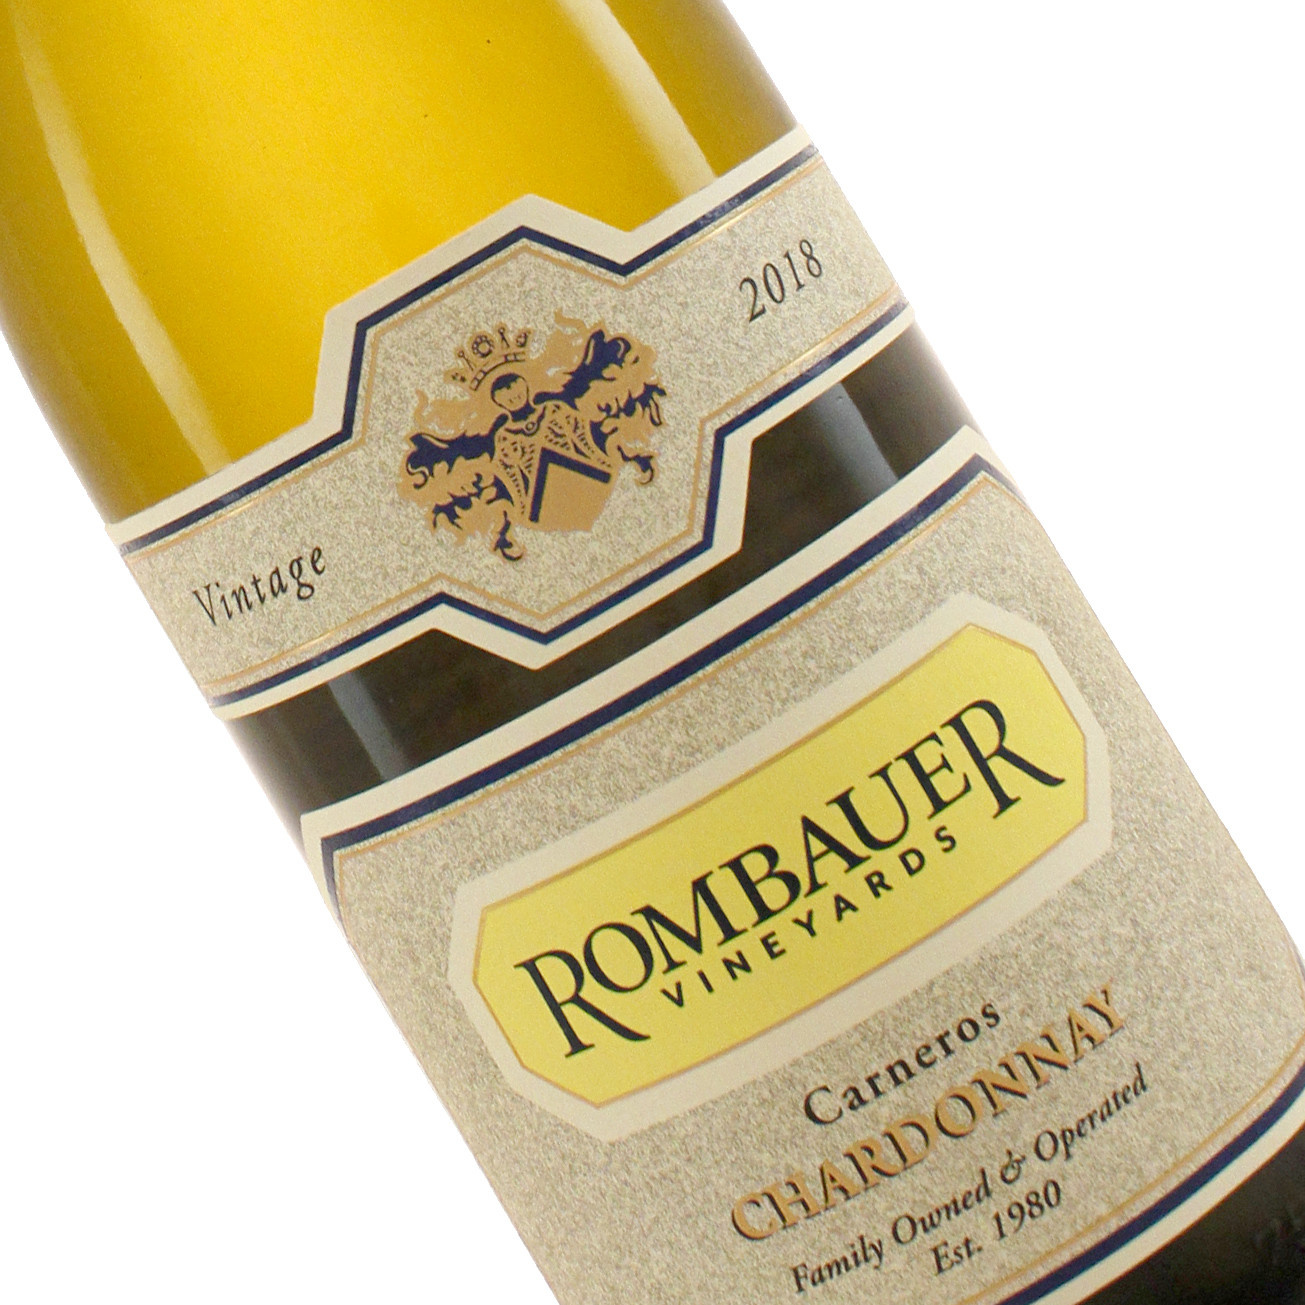 Rombauer 2019 Chardonnay, Carneros, California